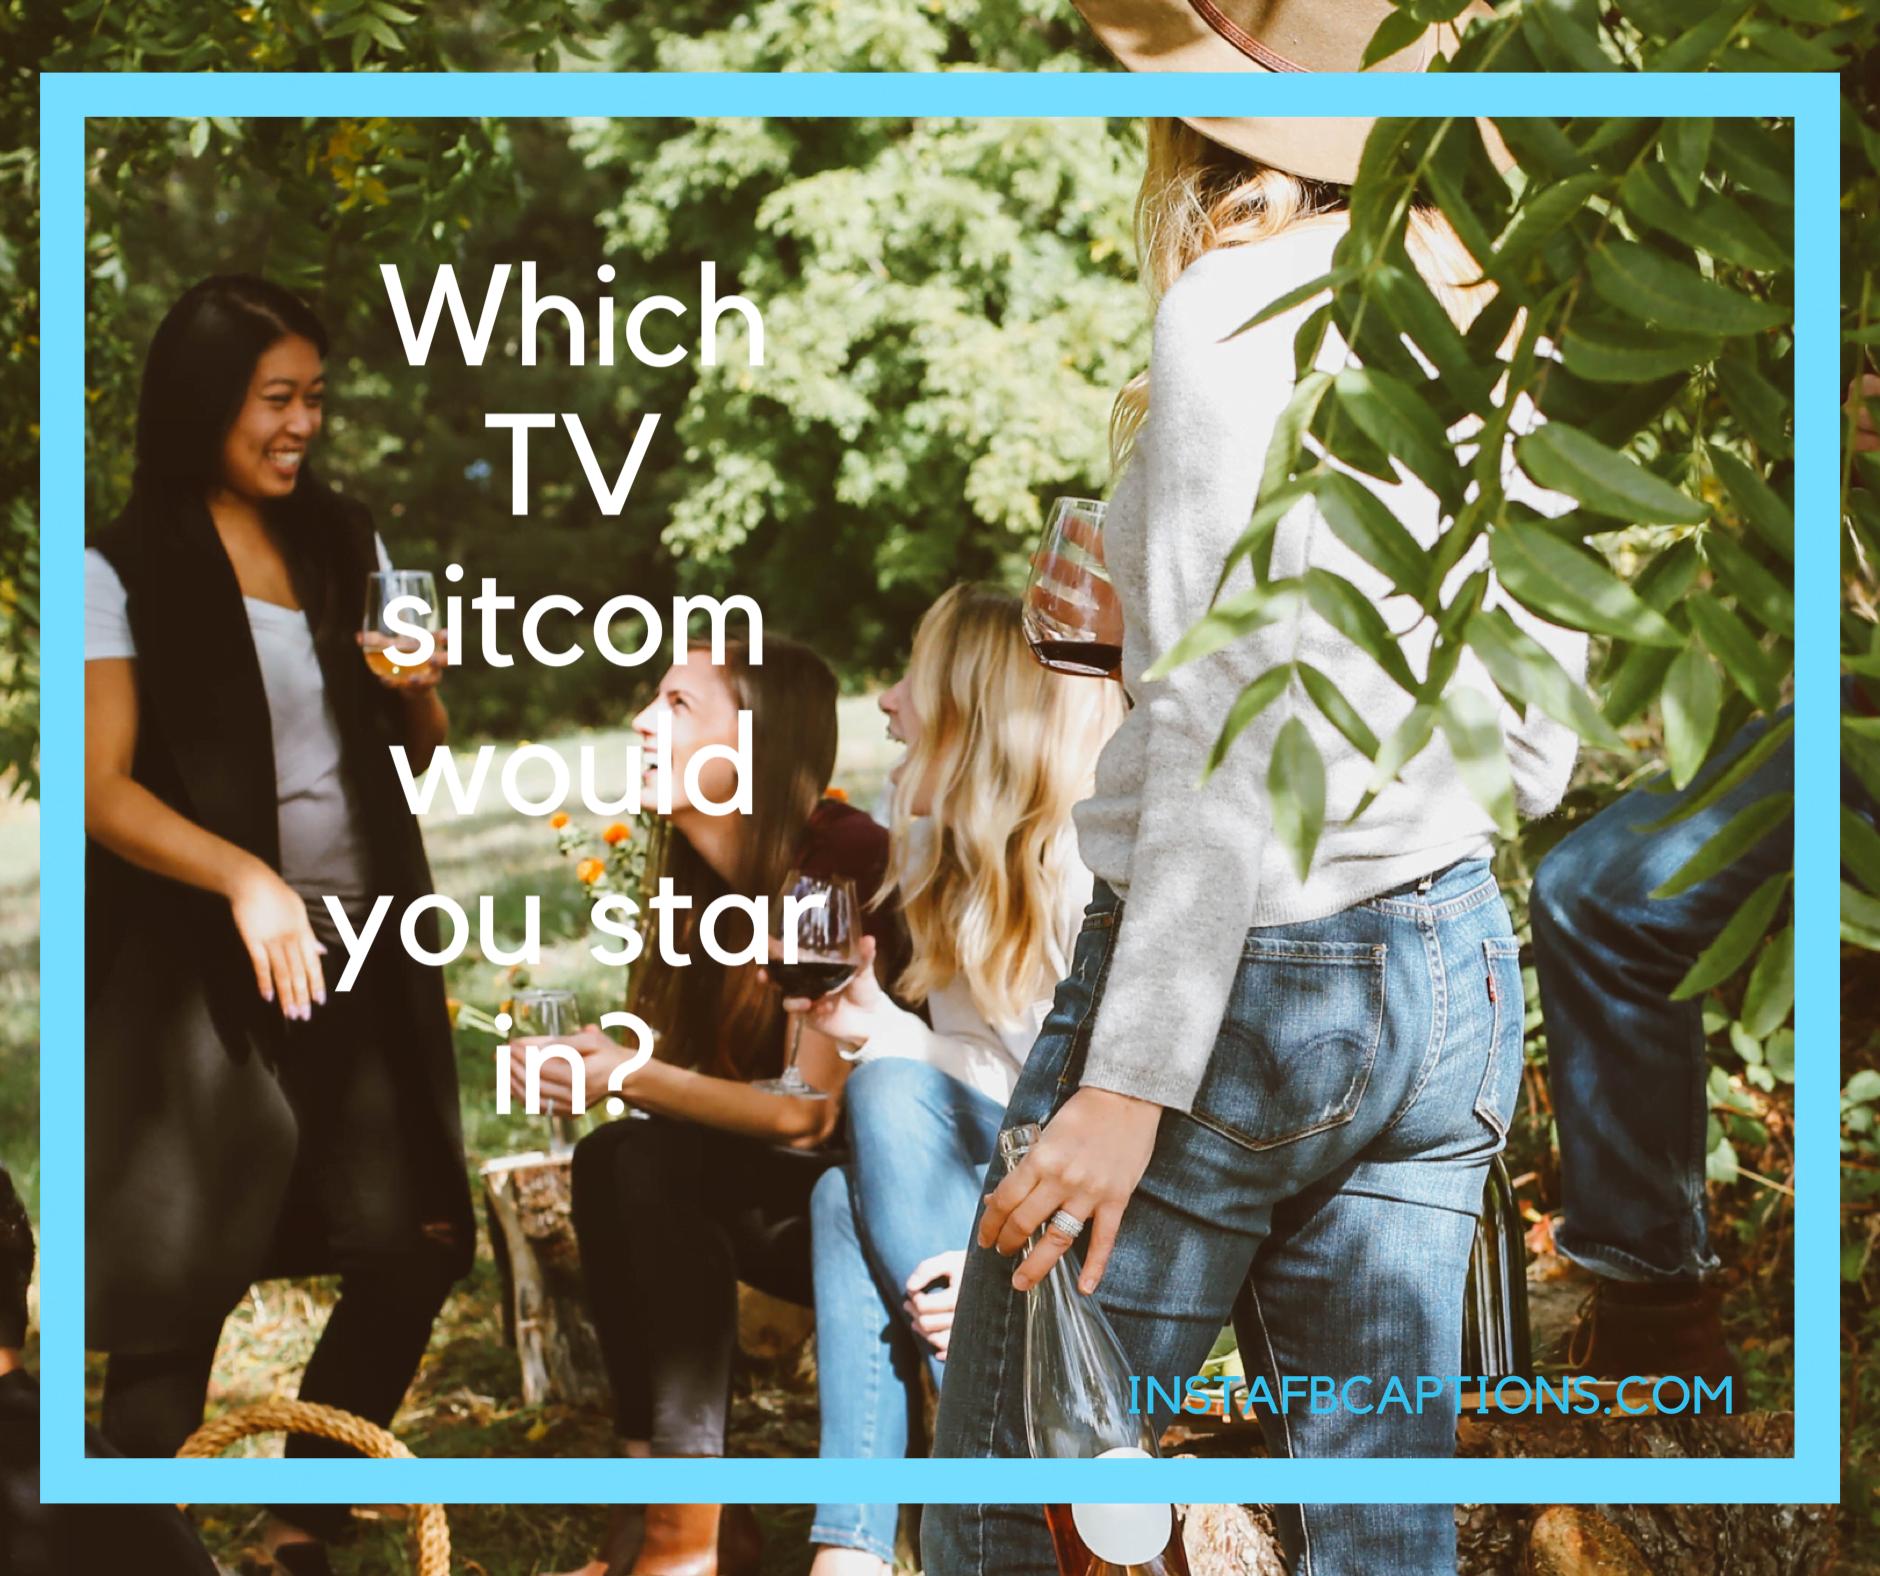 Fun questions for friends  - B146CC5B DEA6 43B1 A475 E4185DAF1F9B - Crazy QUESTIONS To Ask FRIENDS in 2021